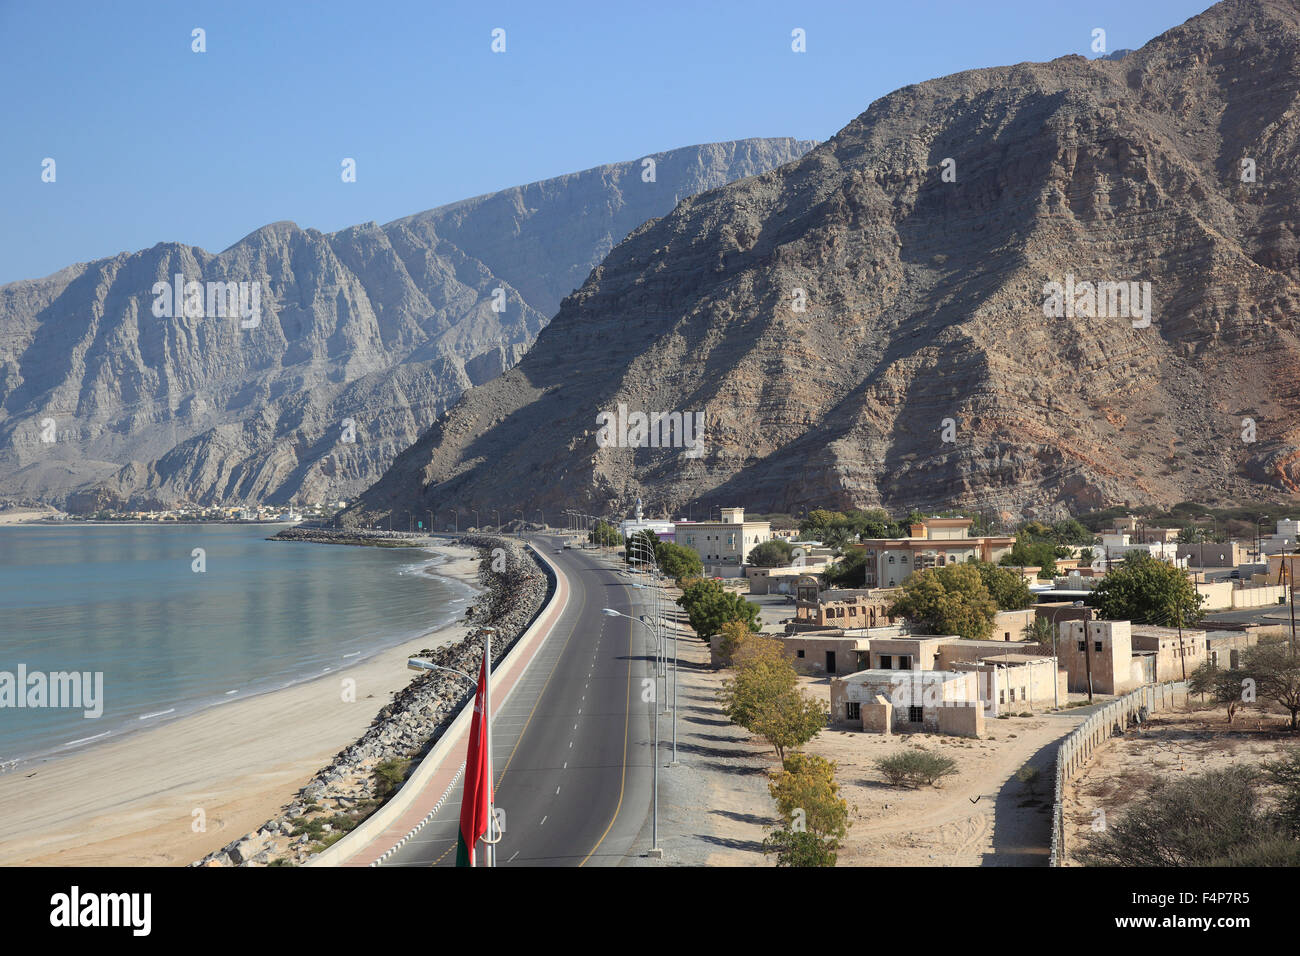 Bukha, Bucha, in the granny's niches enclave of Musandam, Oman Stock Photo